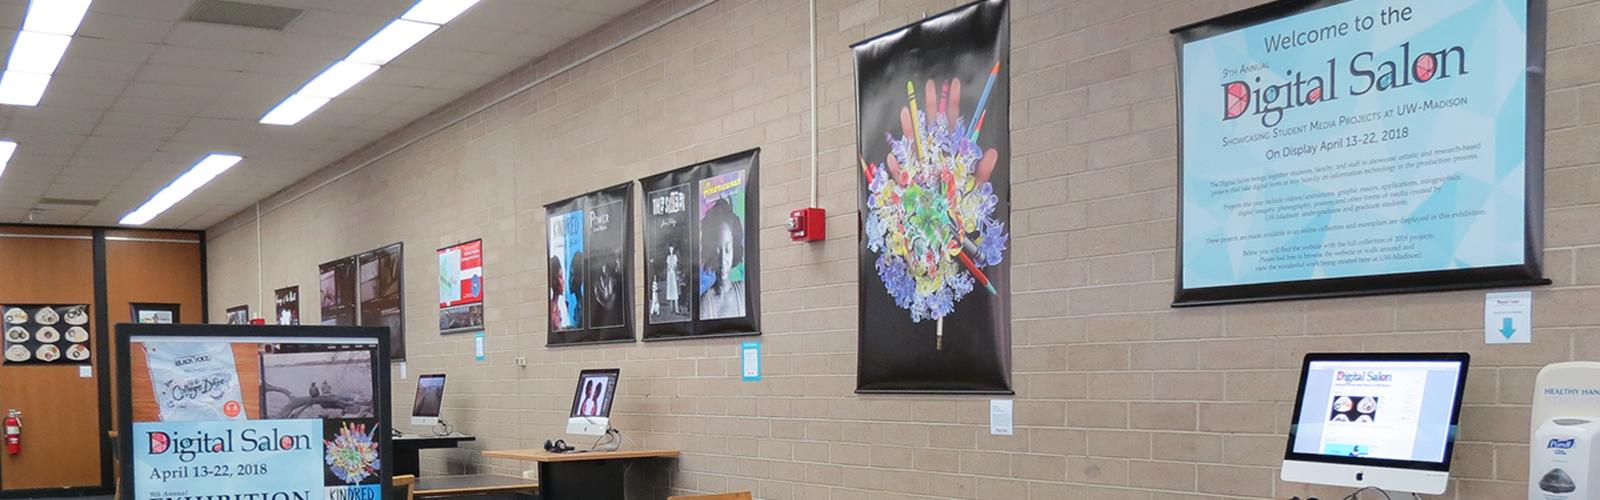 Digital Salon 2018 Exhibition in College Library